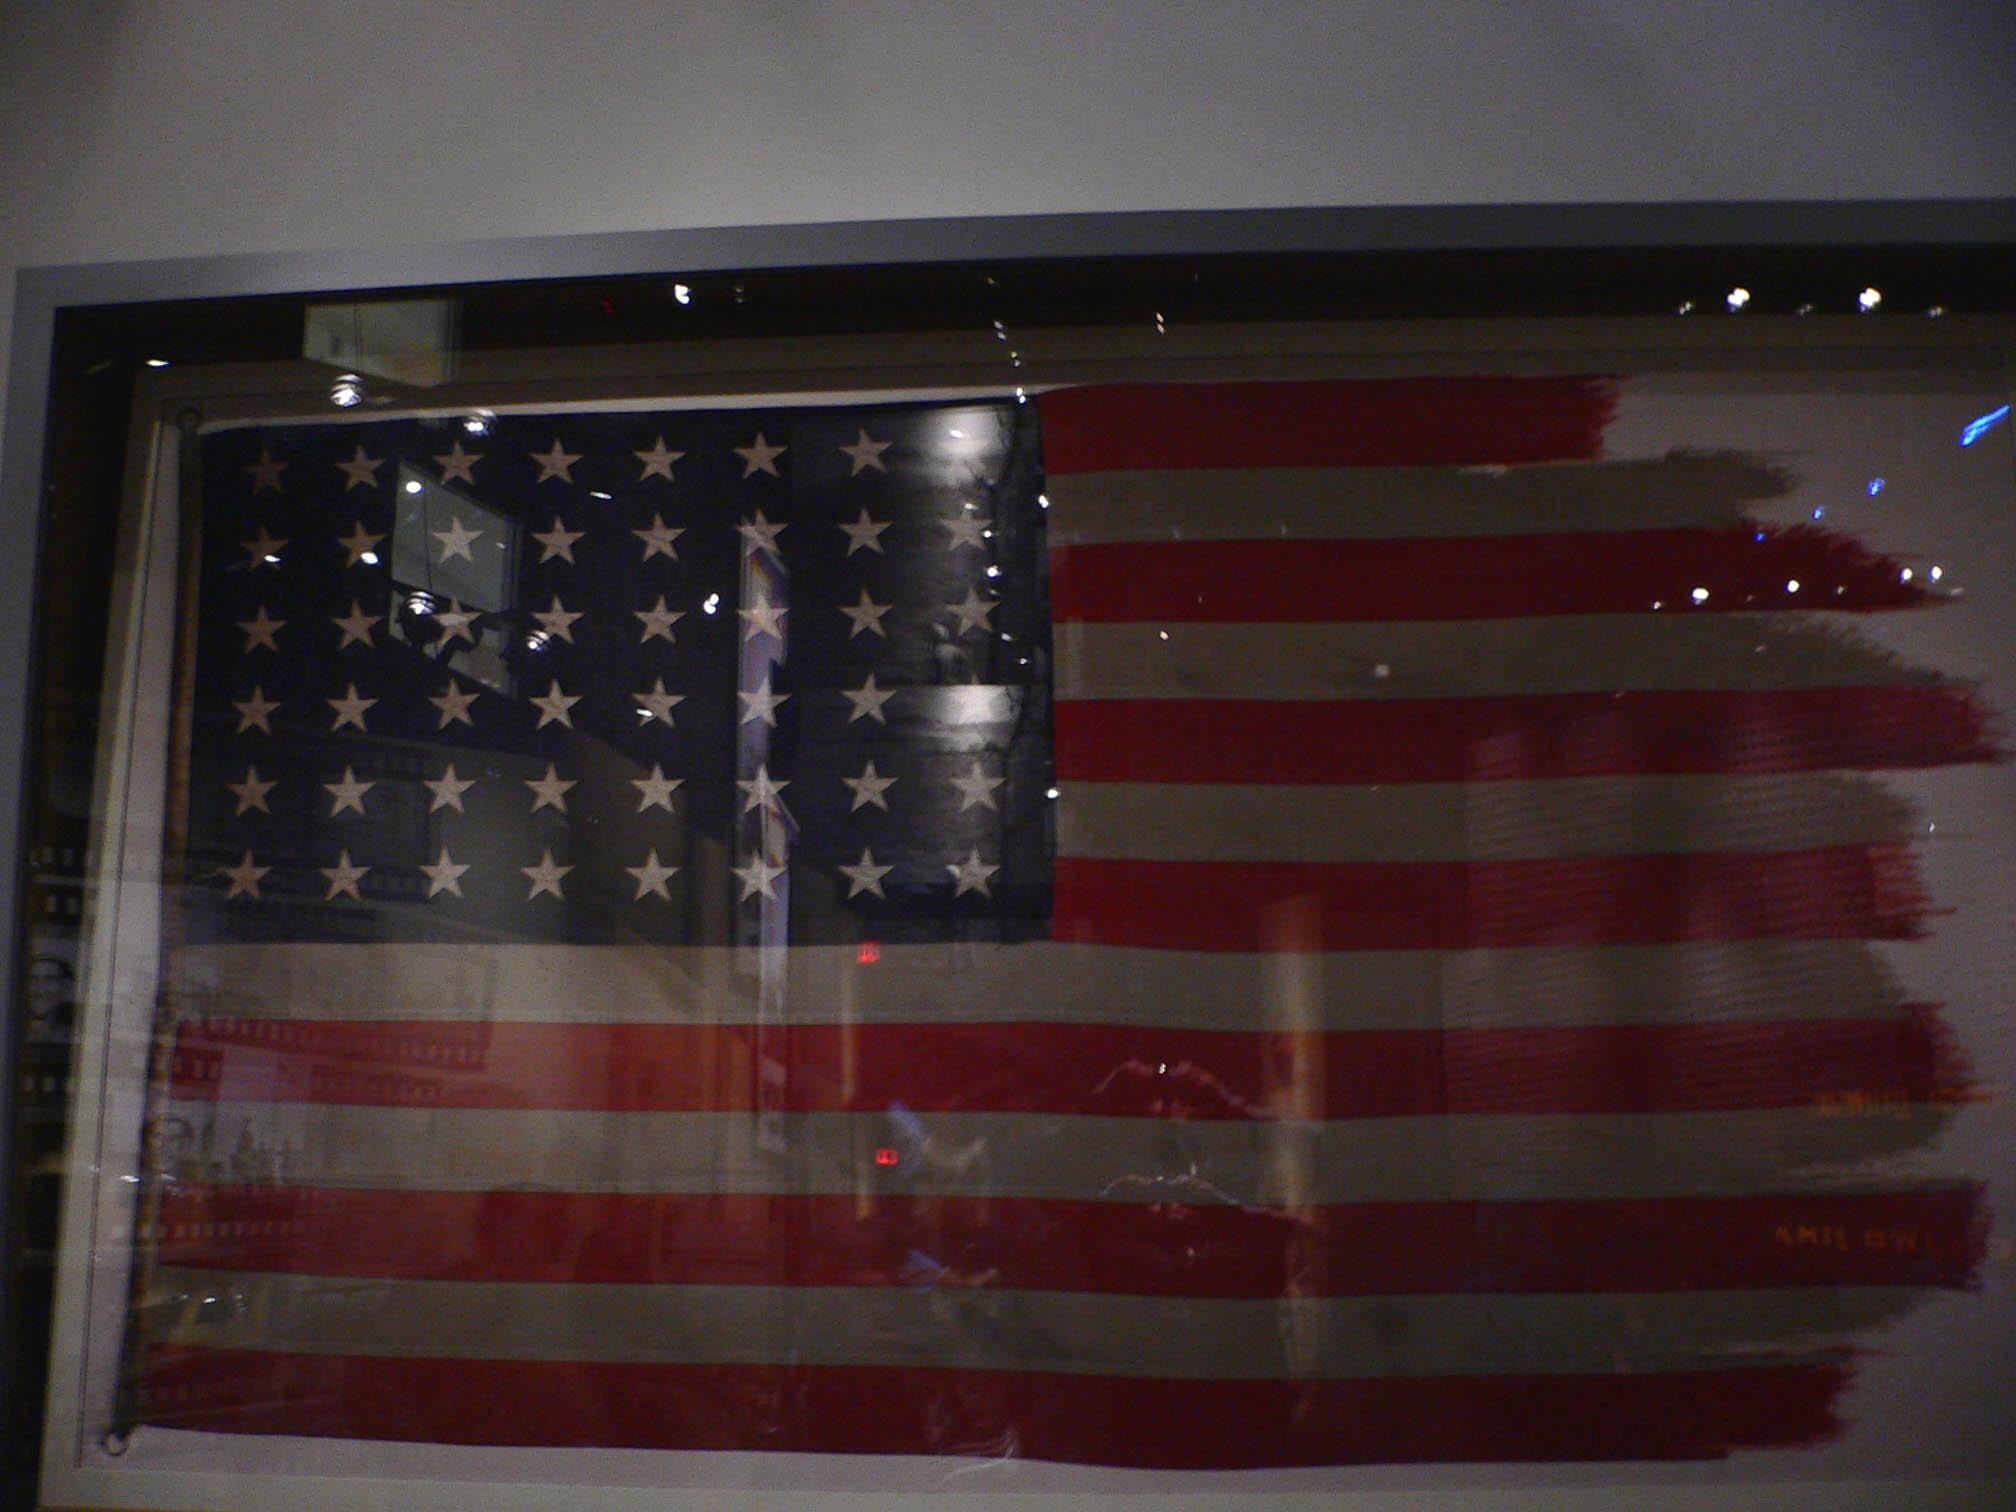 File:Iwo Jima flag.jpg - Wikimedia Commons